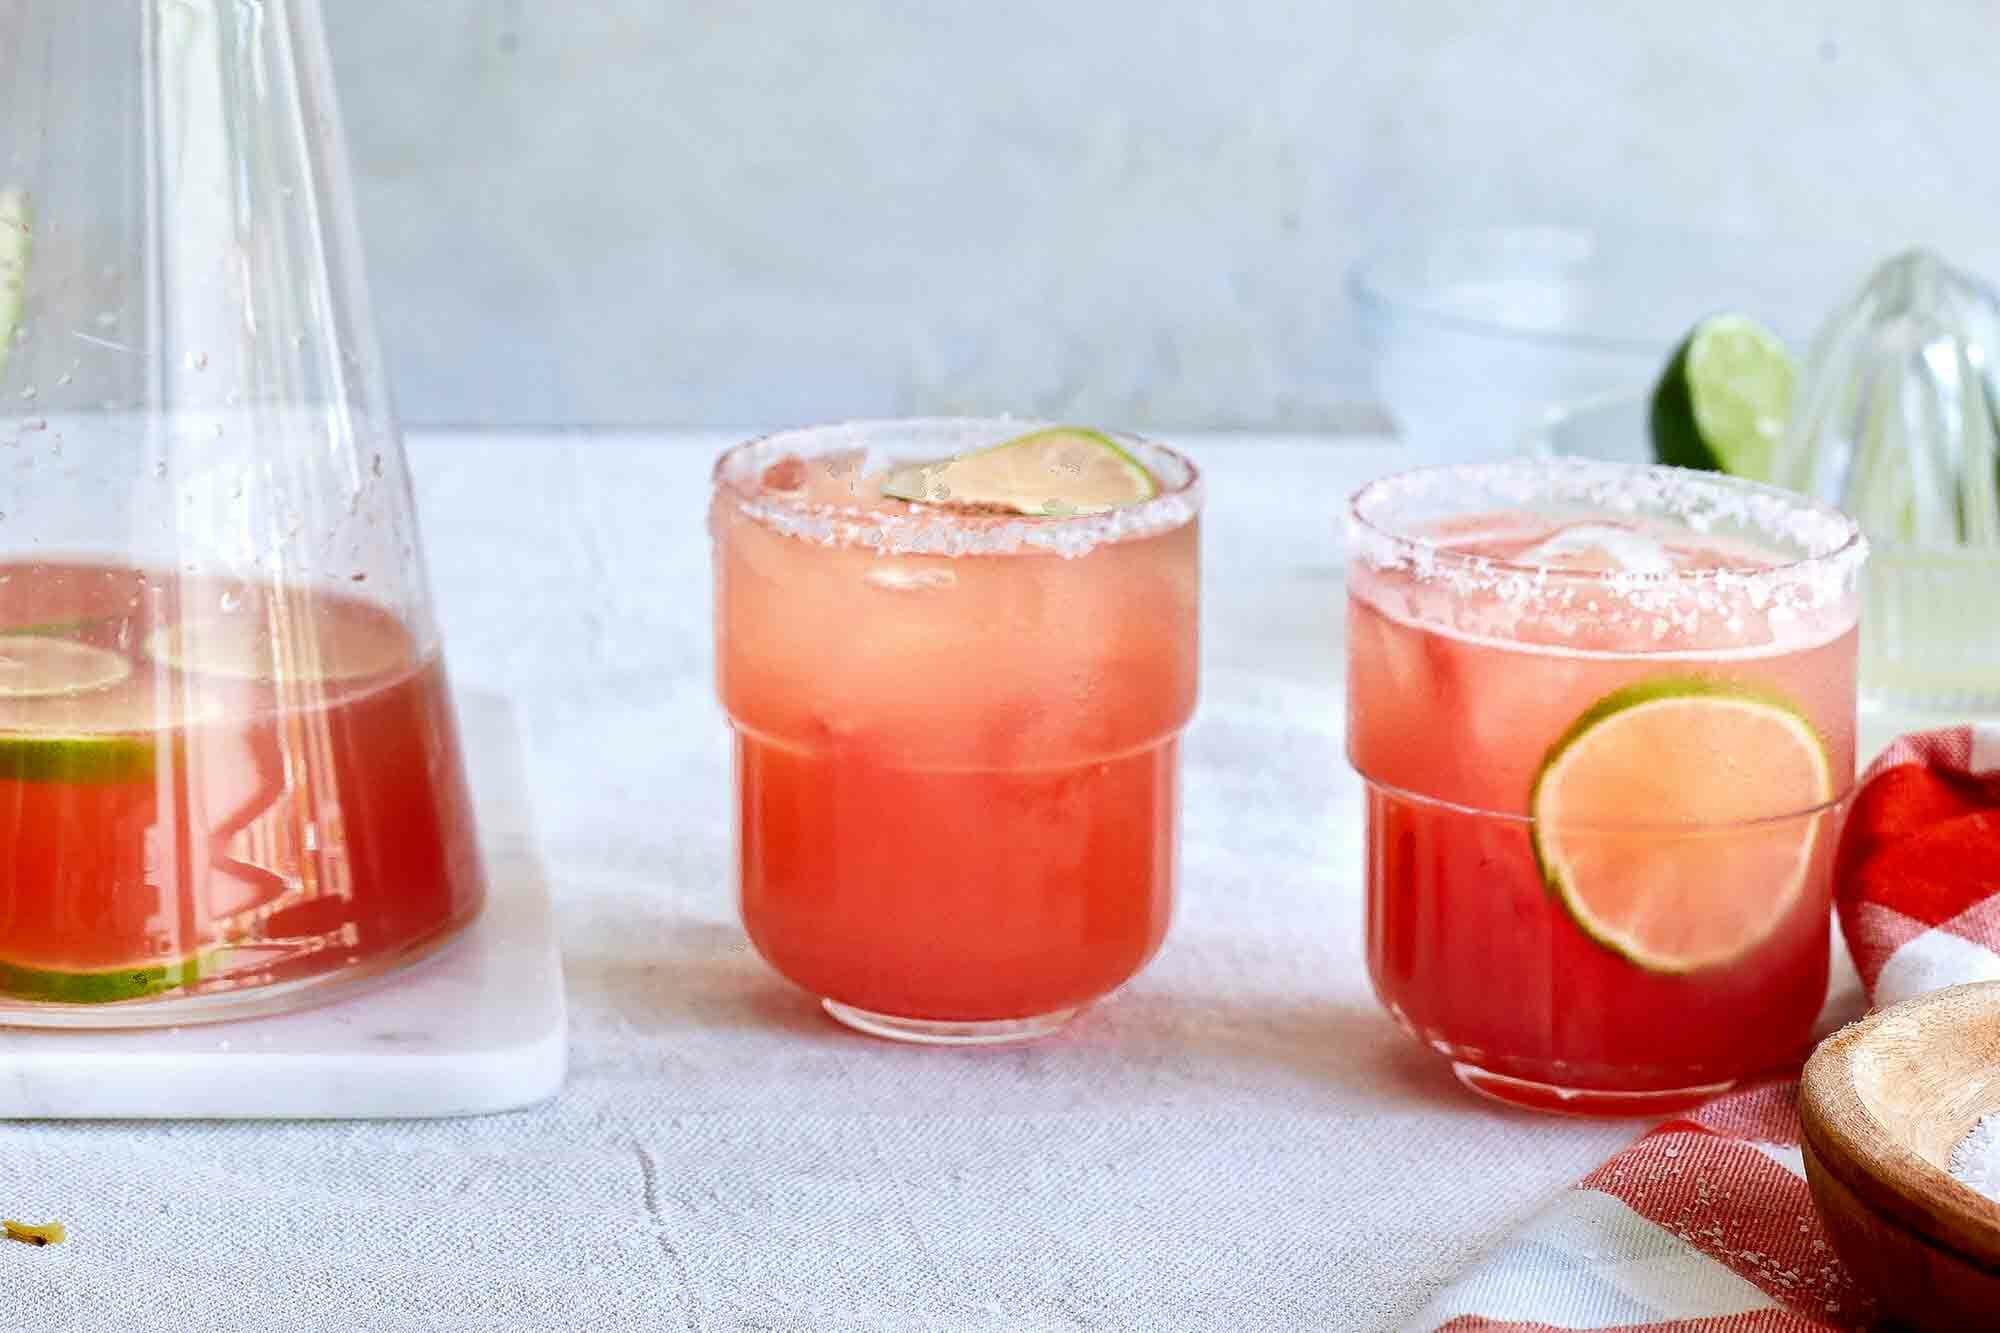 Watermelon margaritas for a crowd